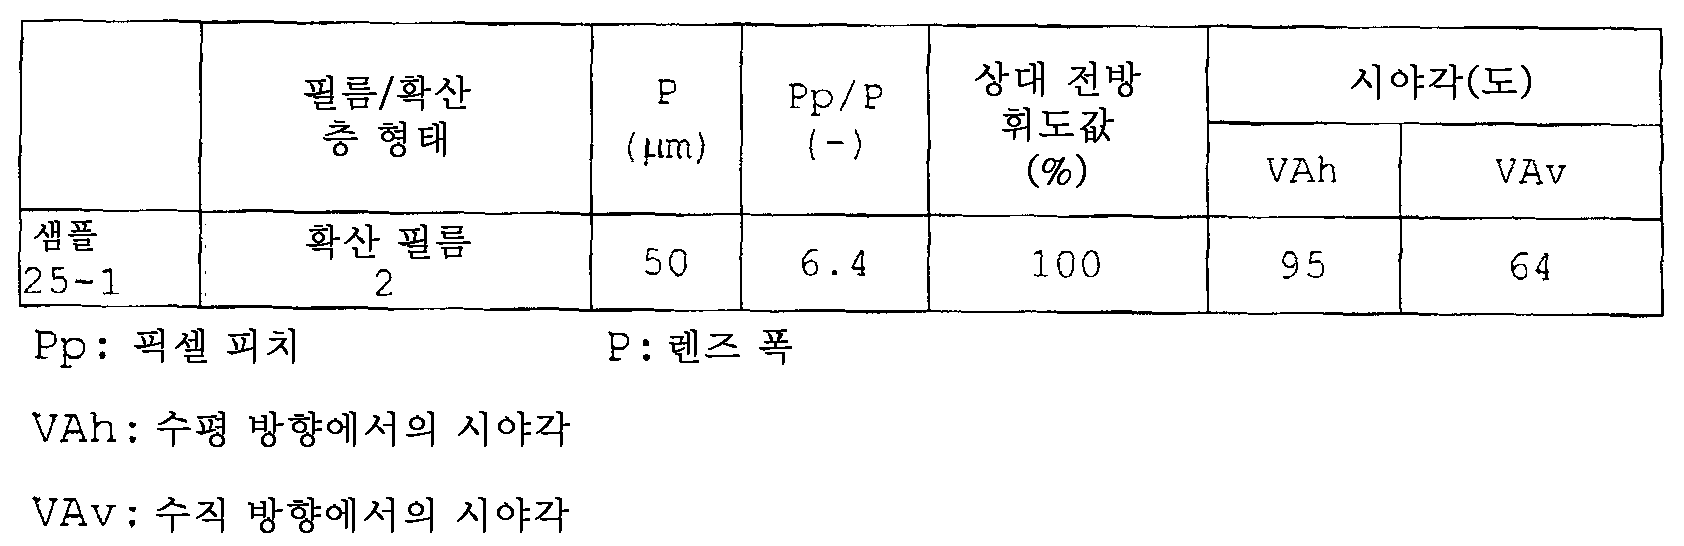 Figure 112007028339804-pat00041